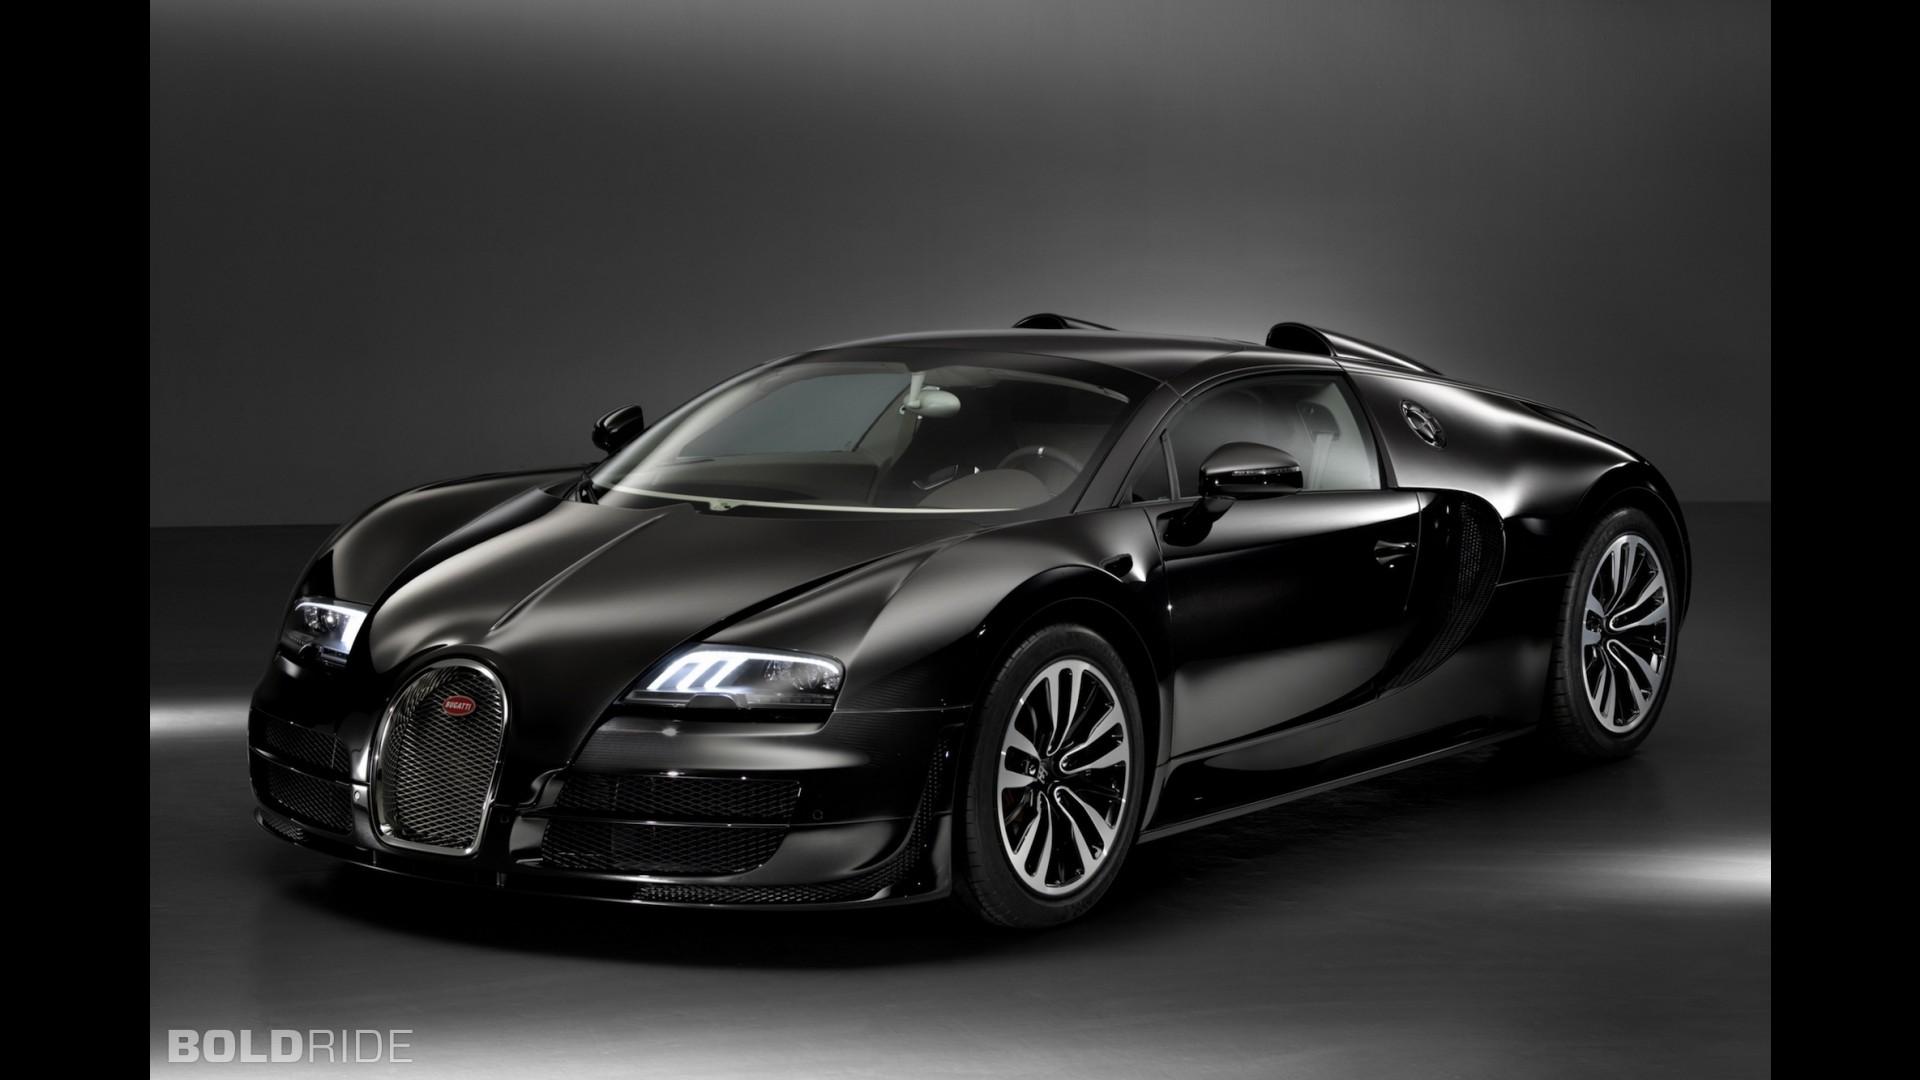 bugatti-veyron-grand-sport-vitesse-legend-jean-bugatti-special-edition Inspiring Bugatti Veyron Quarter Mile Speed Cars Trend